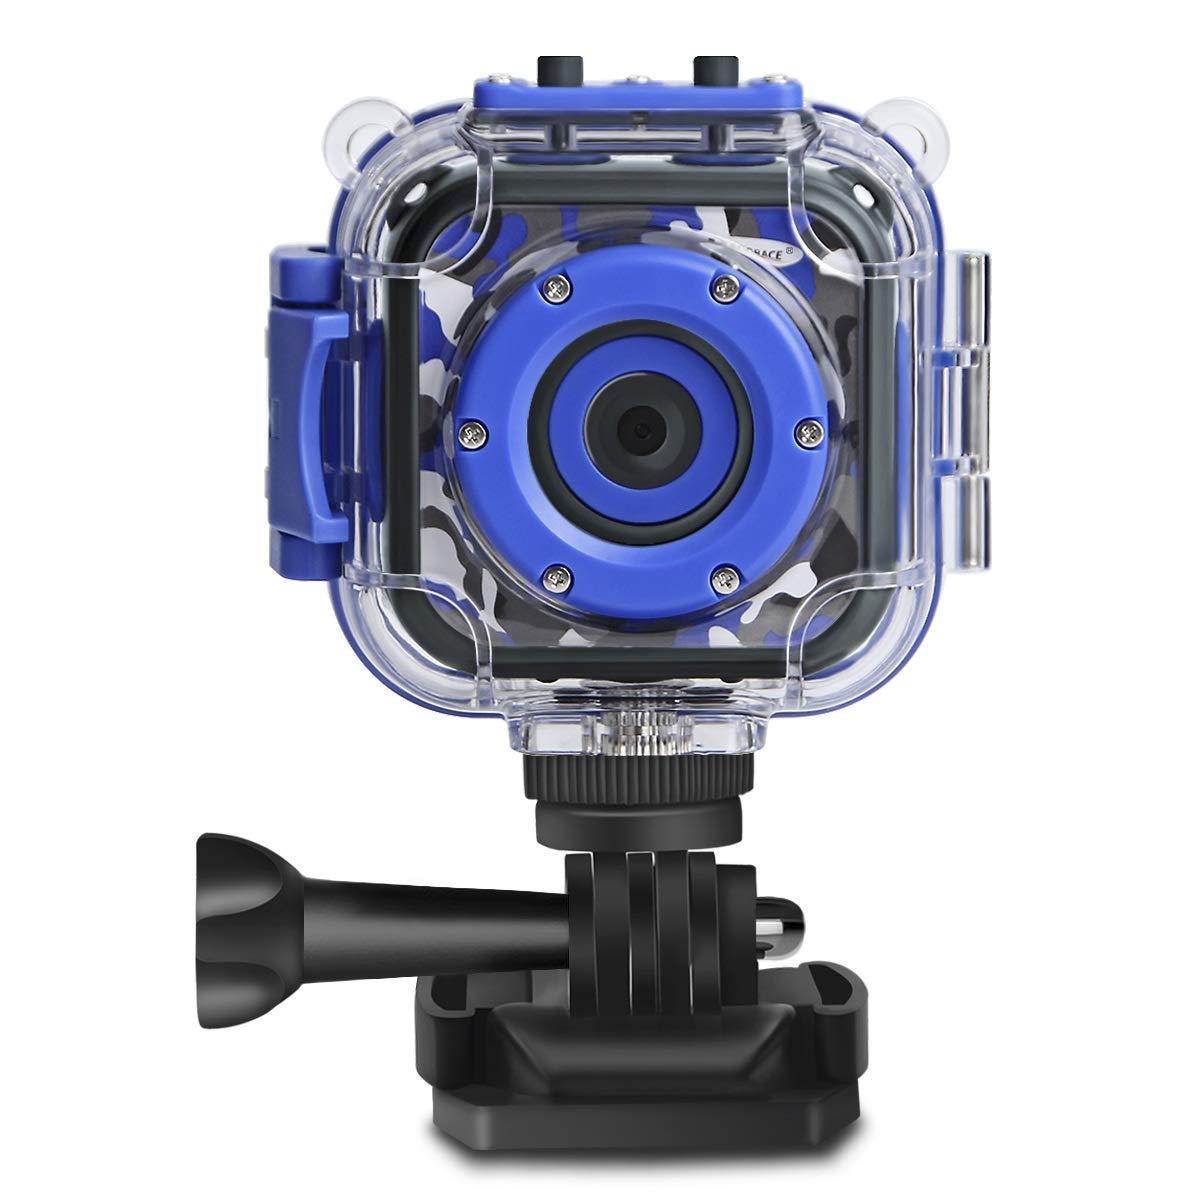 fab little camera